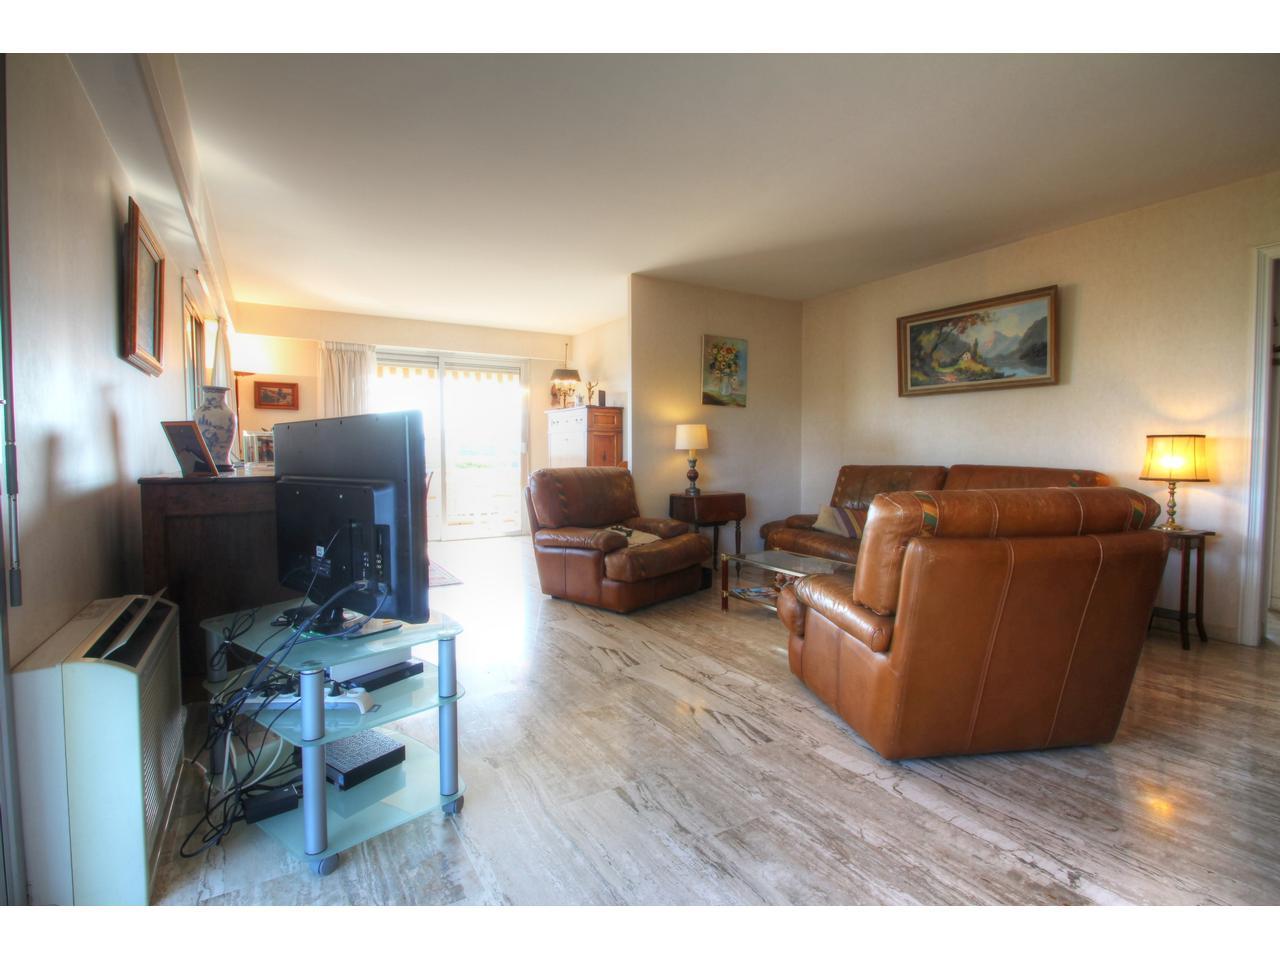 immobilier nice vue mer appartement antibes antibes badine 4 pieces en dernier etage avec vue. Black Bedroom Furniture Sets. Home Design Ideas